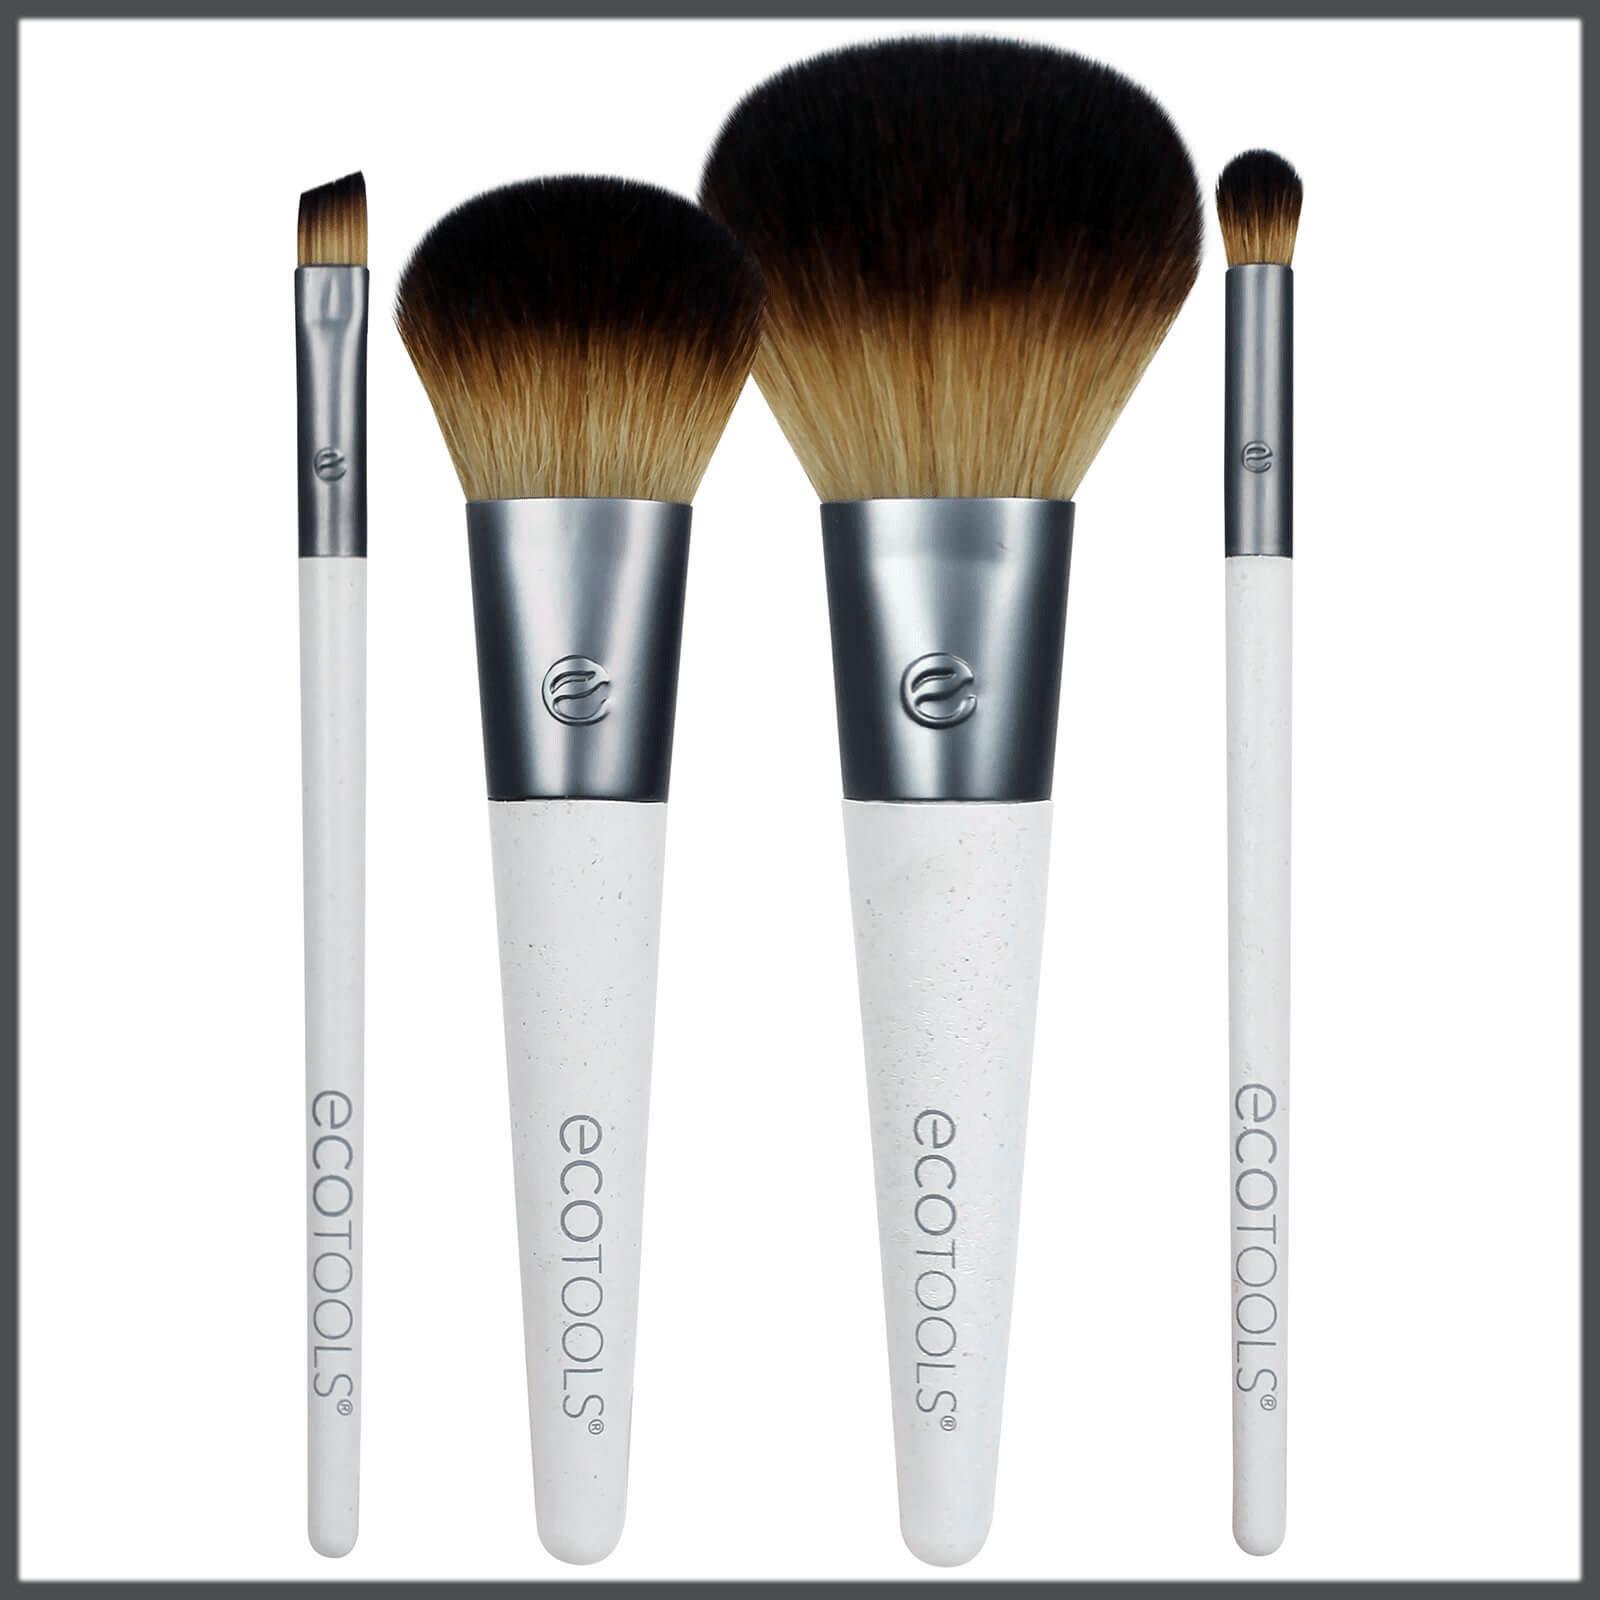 Ecotools makeup brushes sets